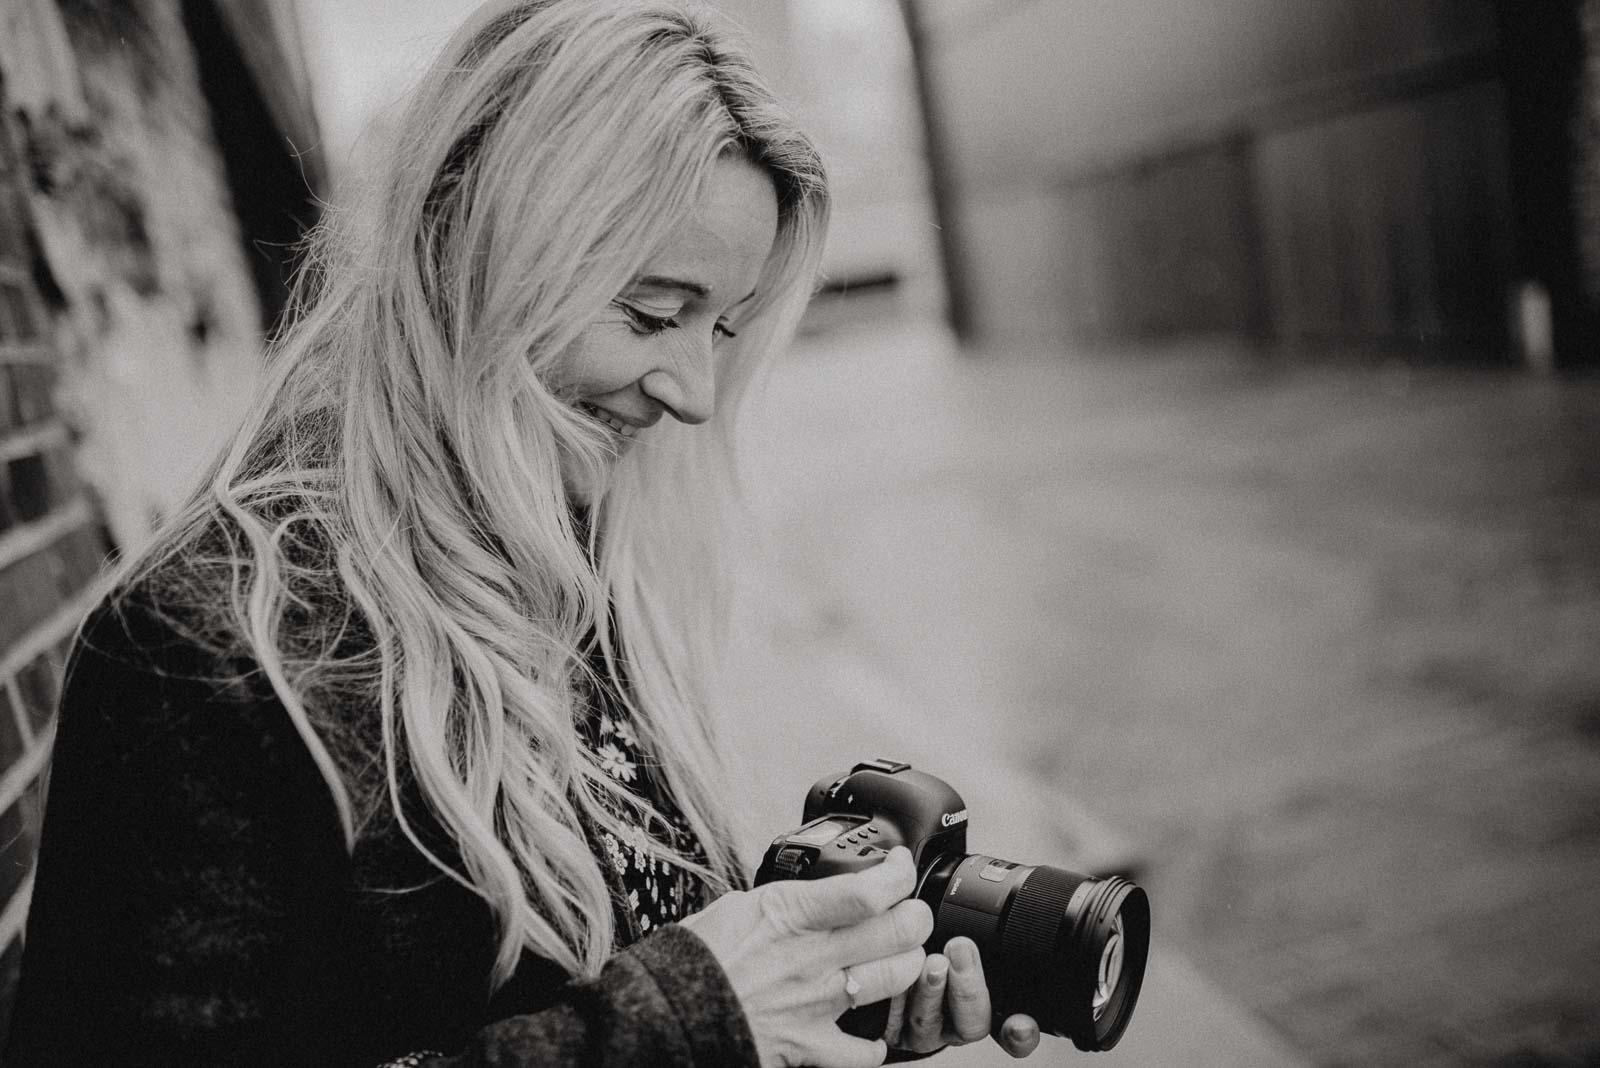 053-fotograf-witten-bochum-businessshooting-urban